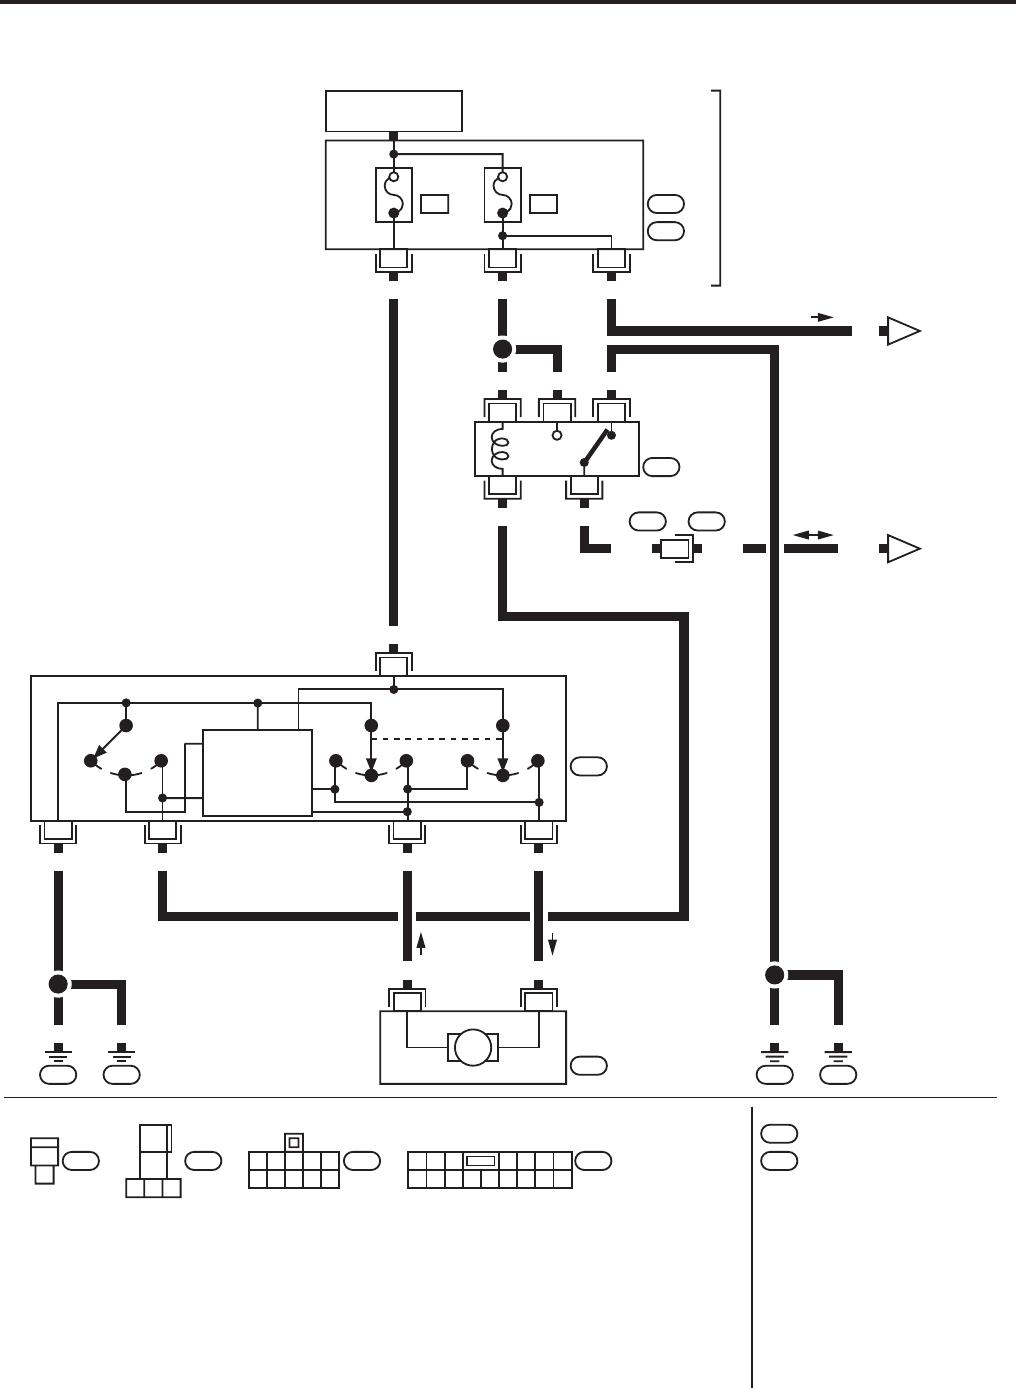 Astounding Nissan Ga16De Wiring Diagram Wiring Library Wiring Cloud Uslyletkolfr09Org